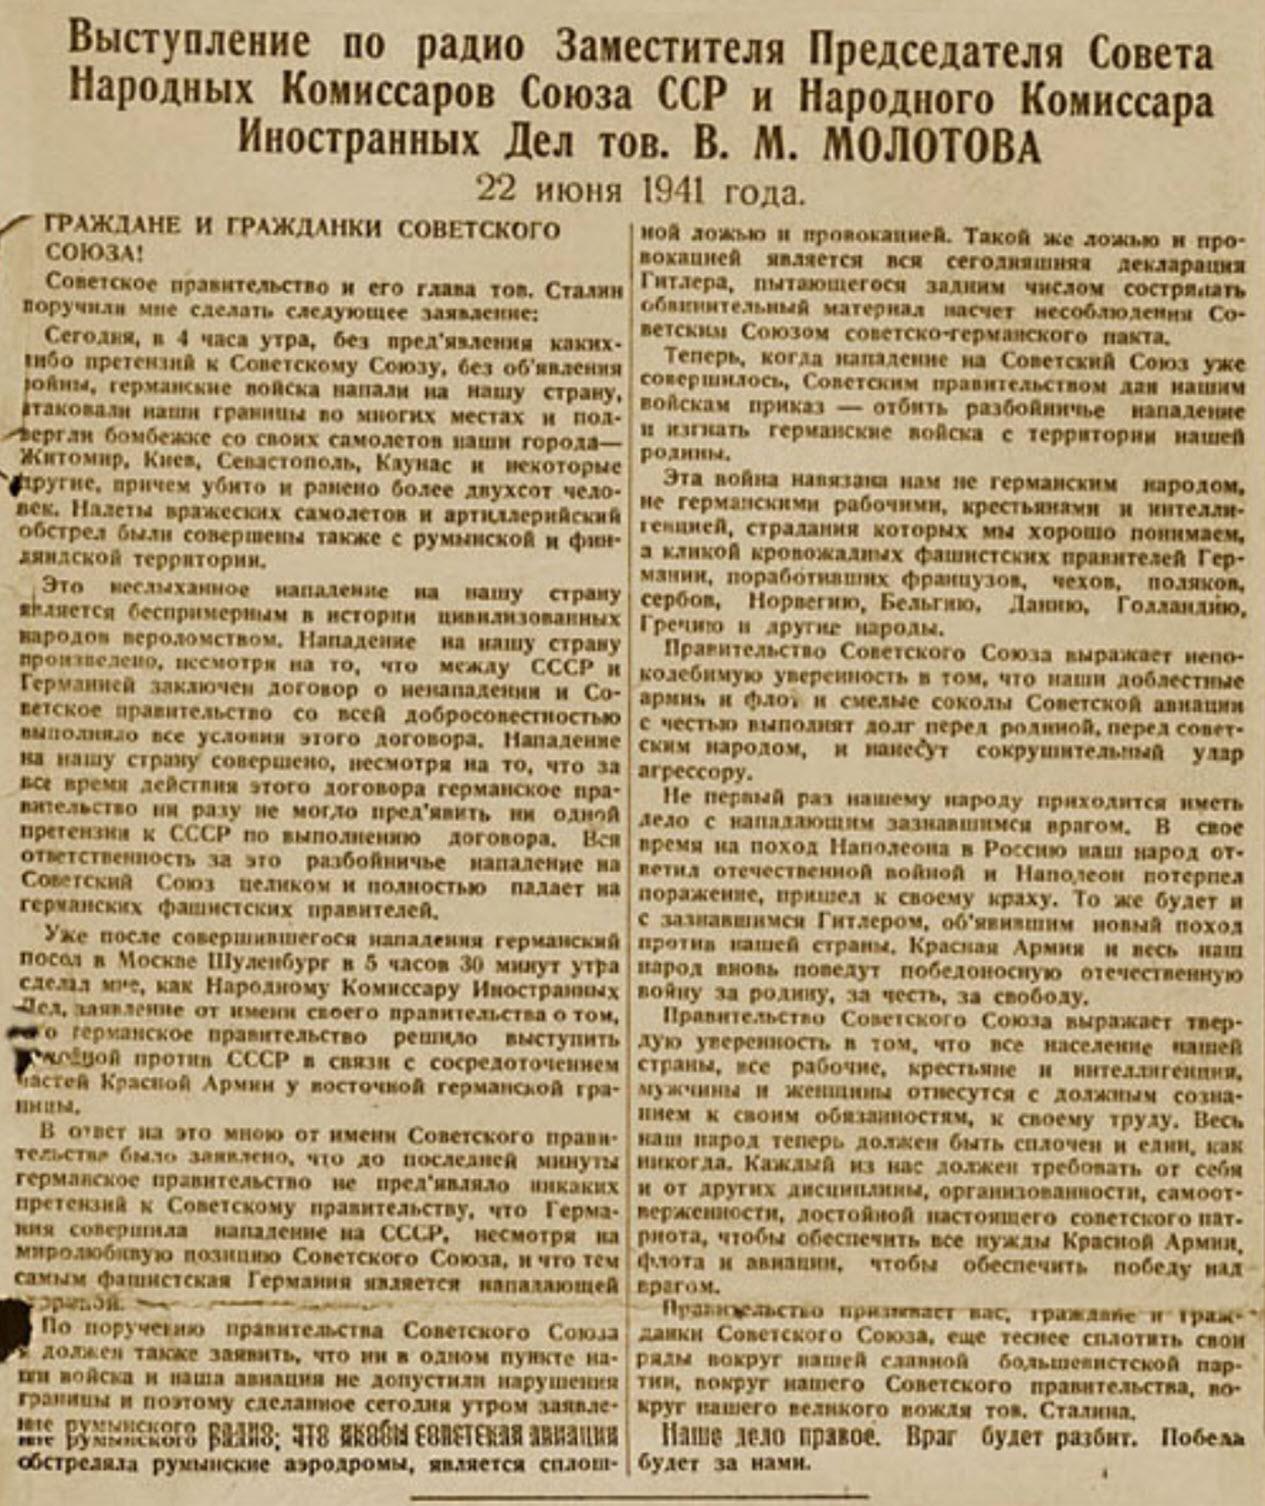 http://www.38brrzk.ru/files/obrawenie-molotova.jpg